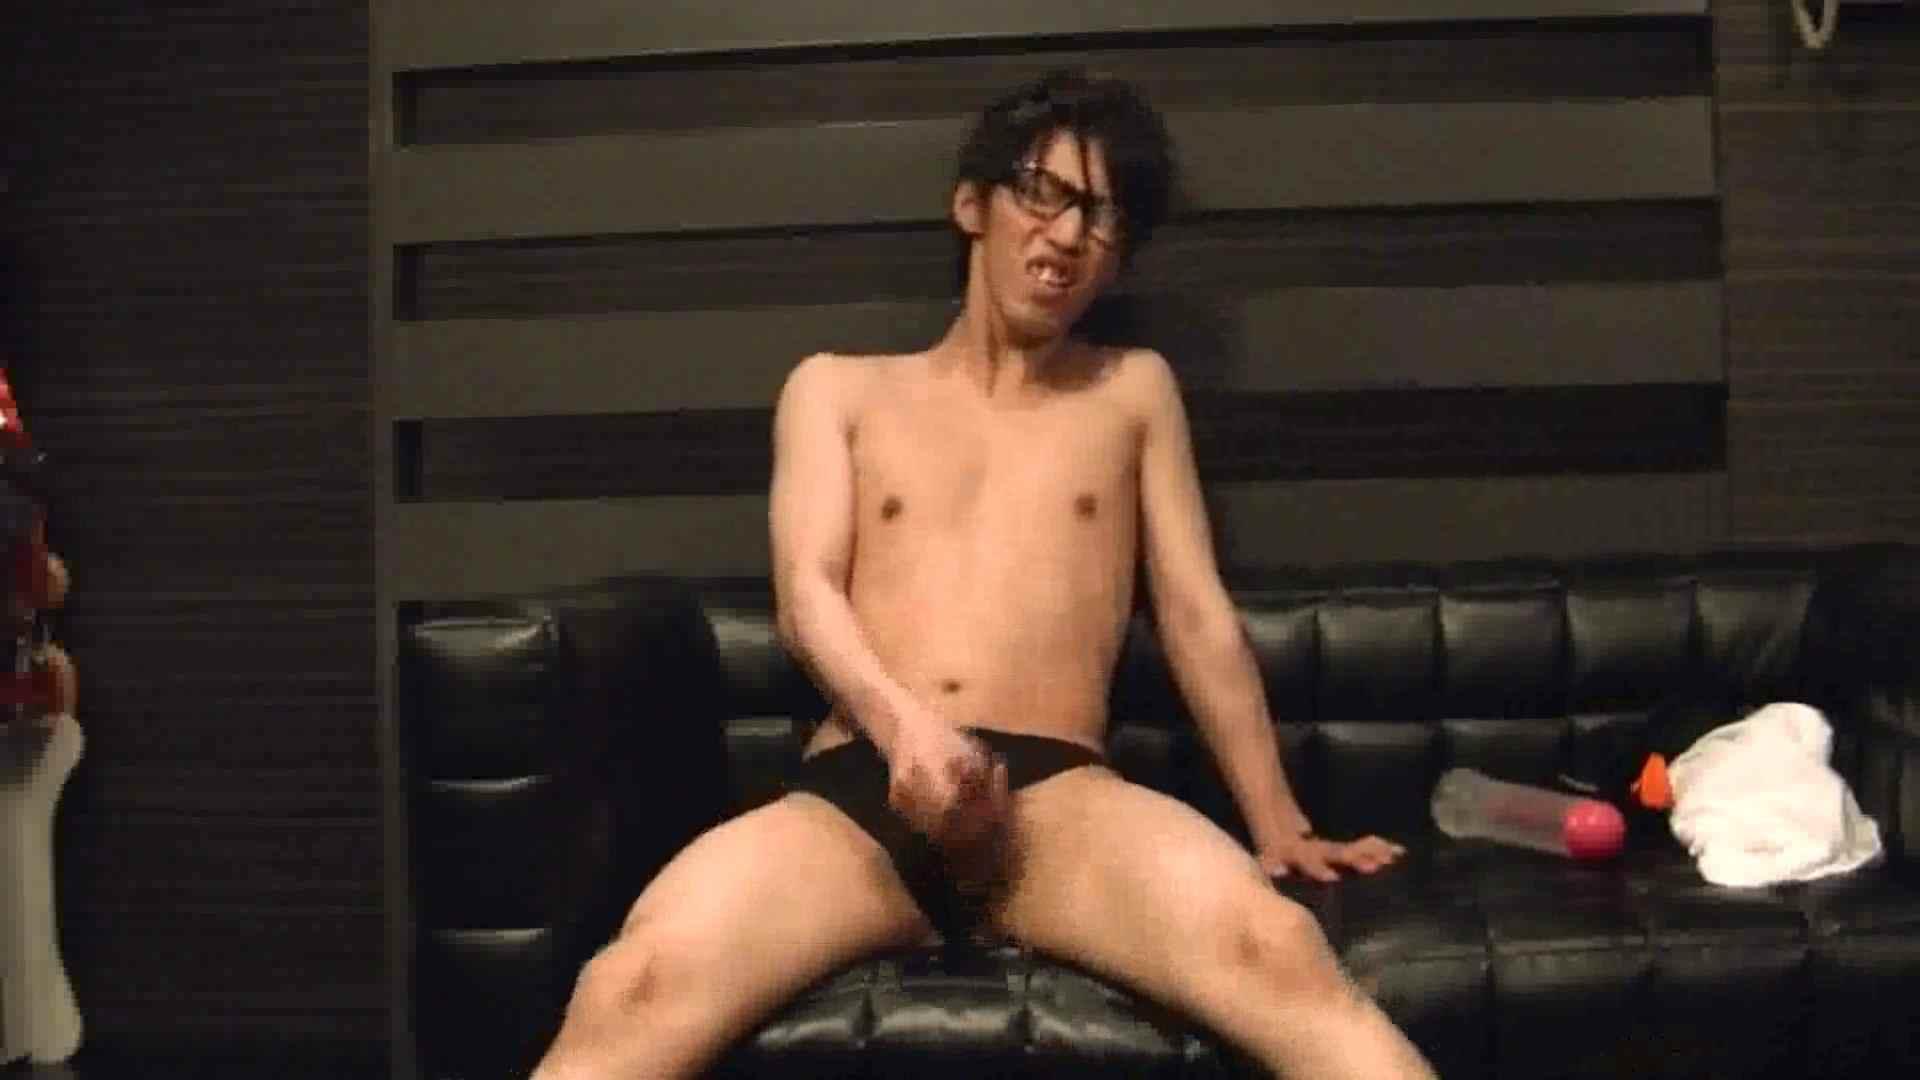 ONA見せカーニバル!! Vol3 男 ゲイ無料無修正画像 89枚 11